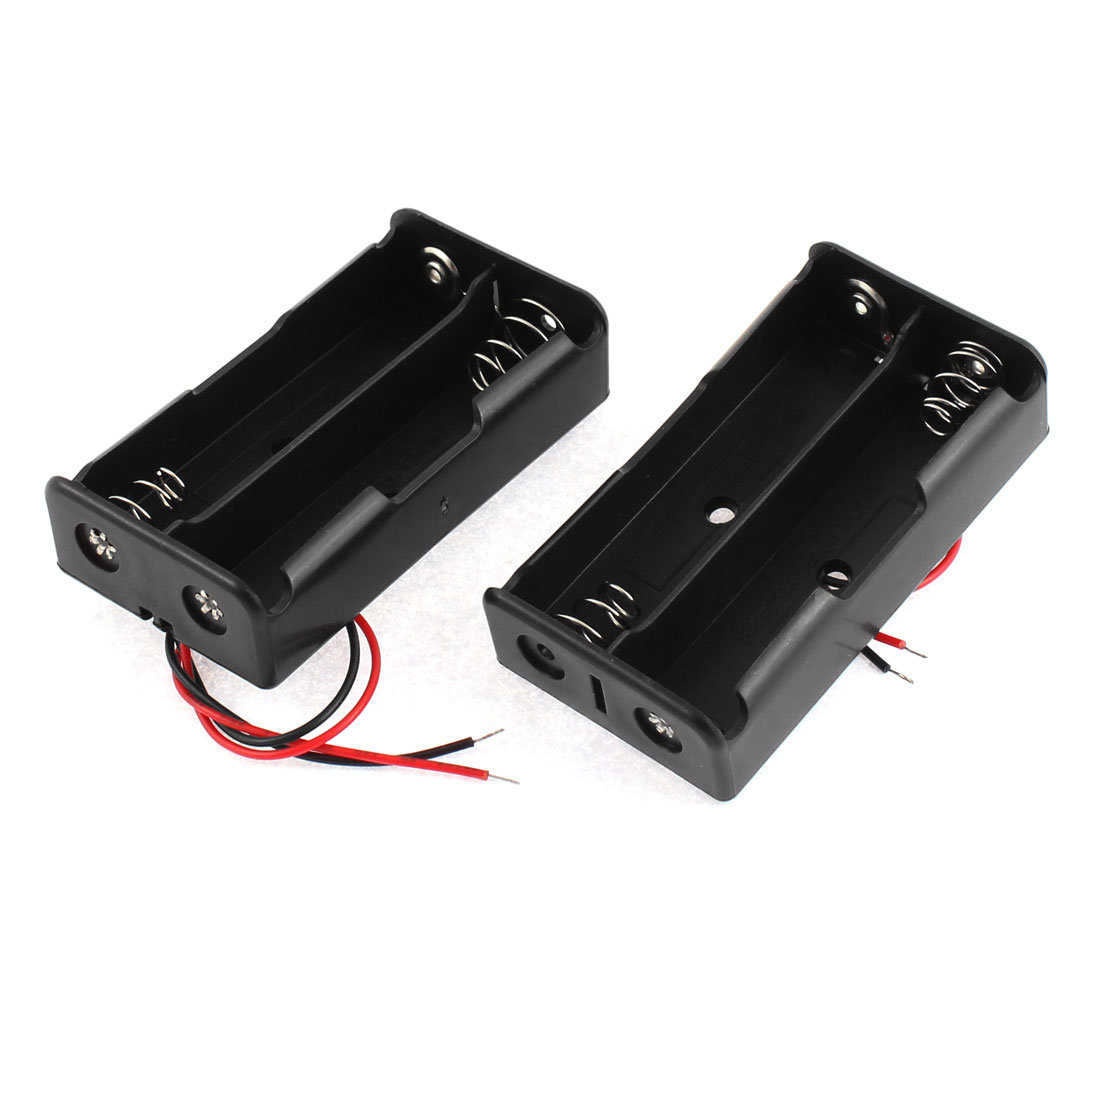 2pcs Spring Loaded Open Frame Plastic Battery Holder Case Storage Box for 2 x 3.7V 18650 Batteries